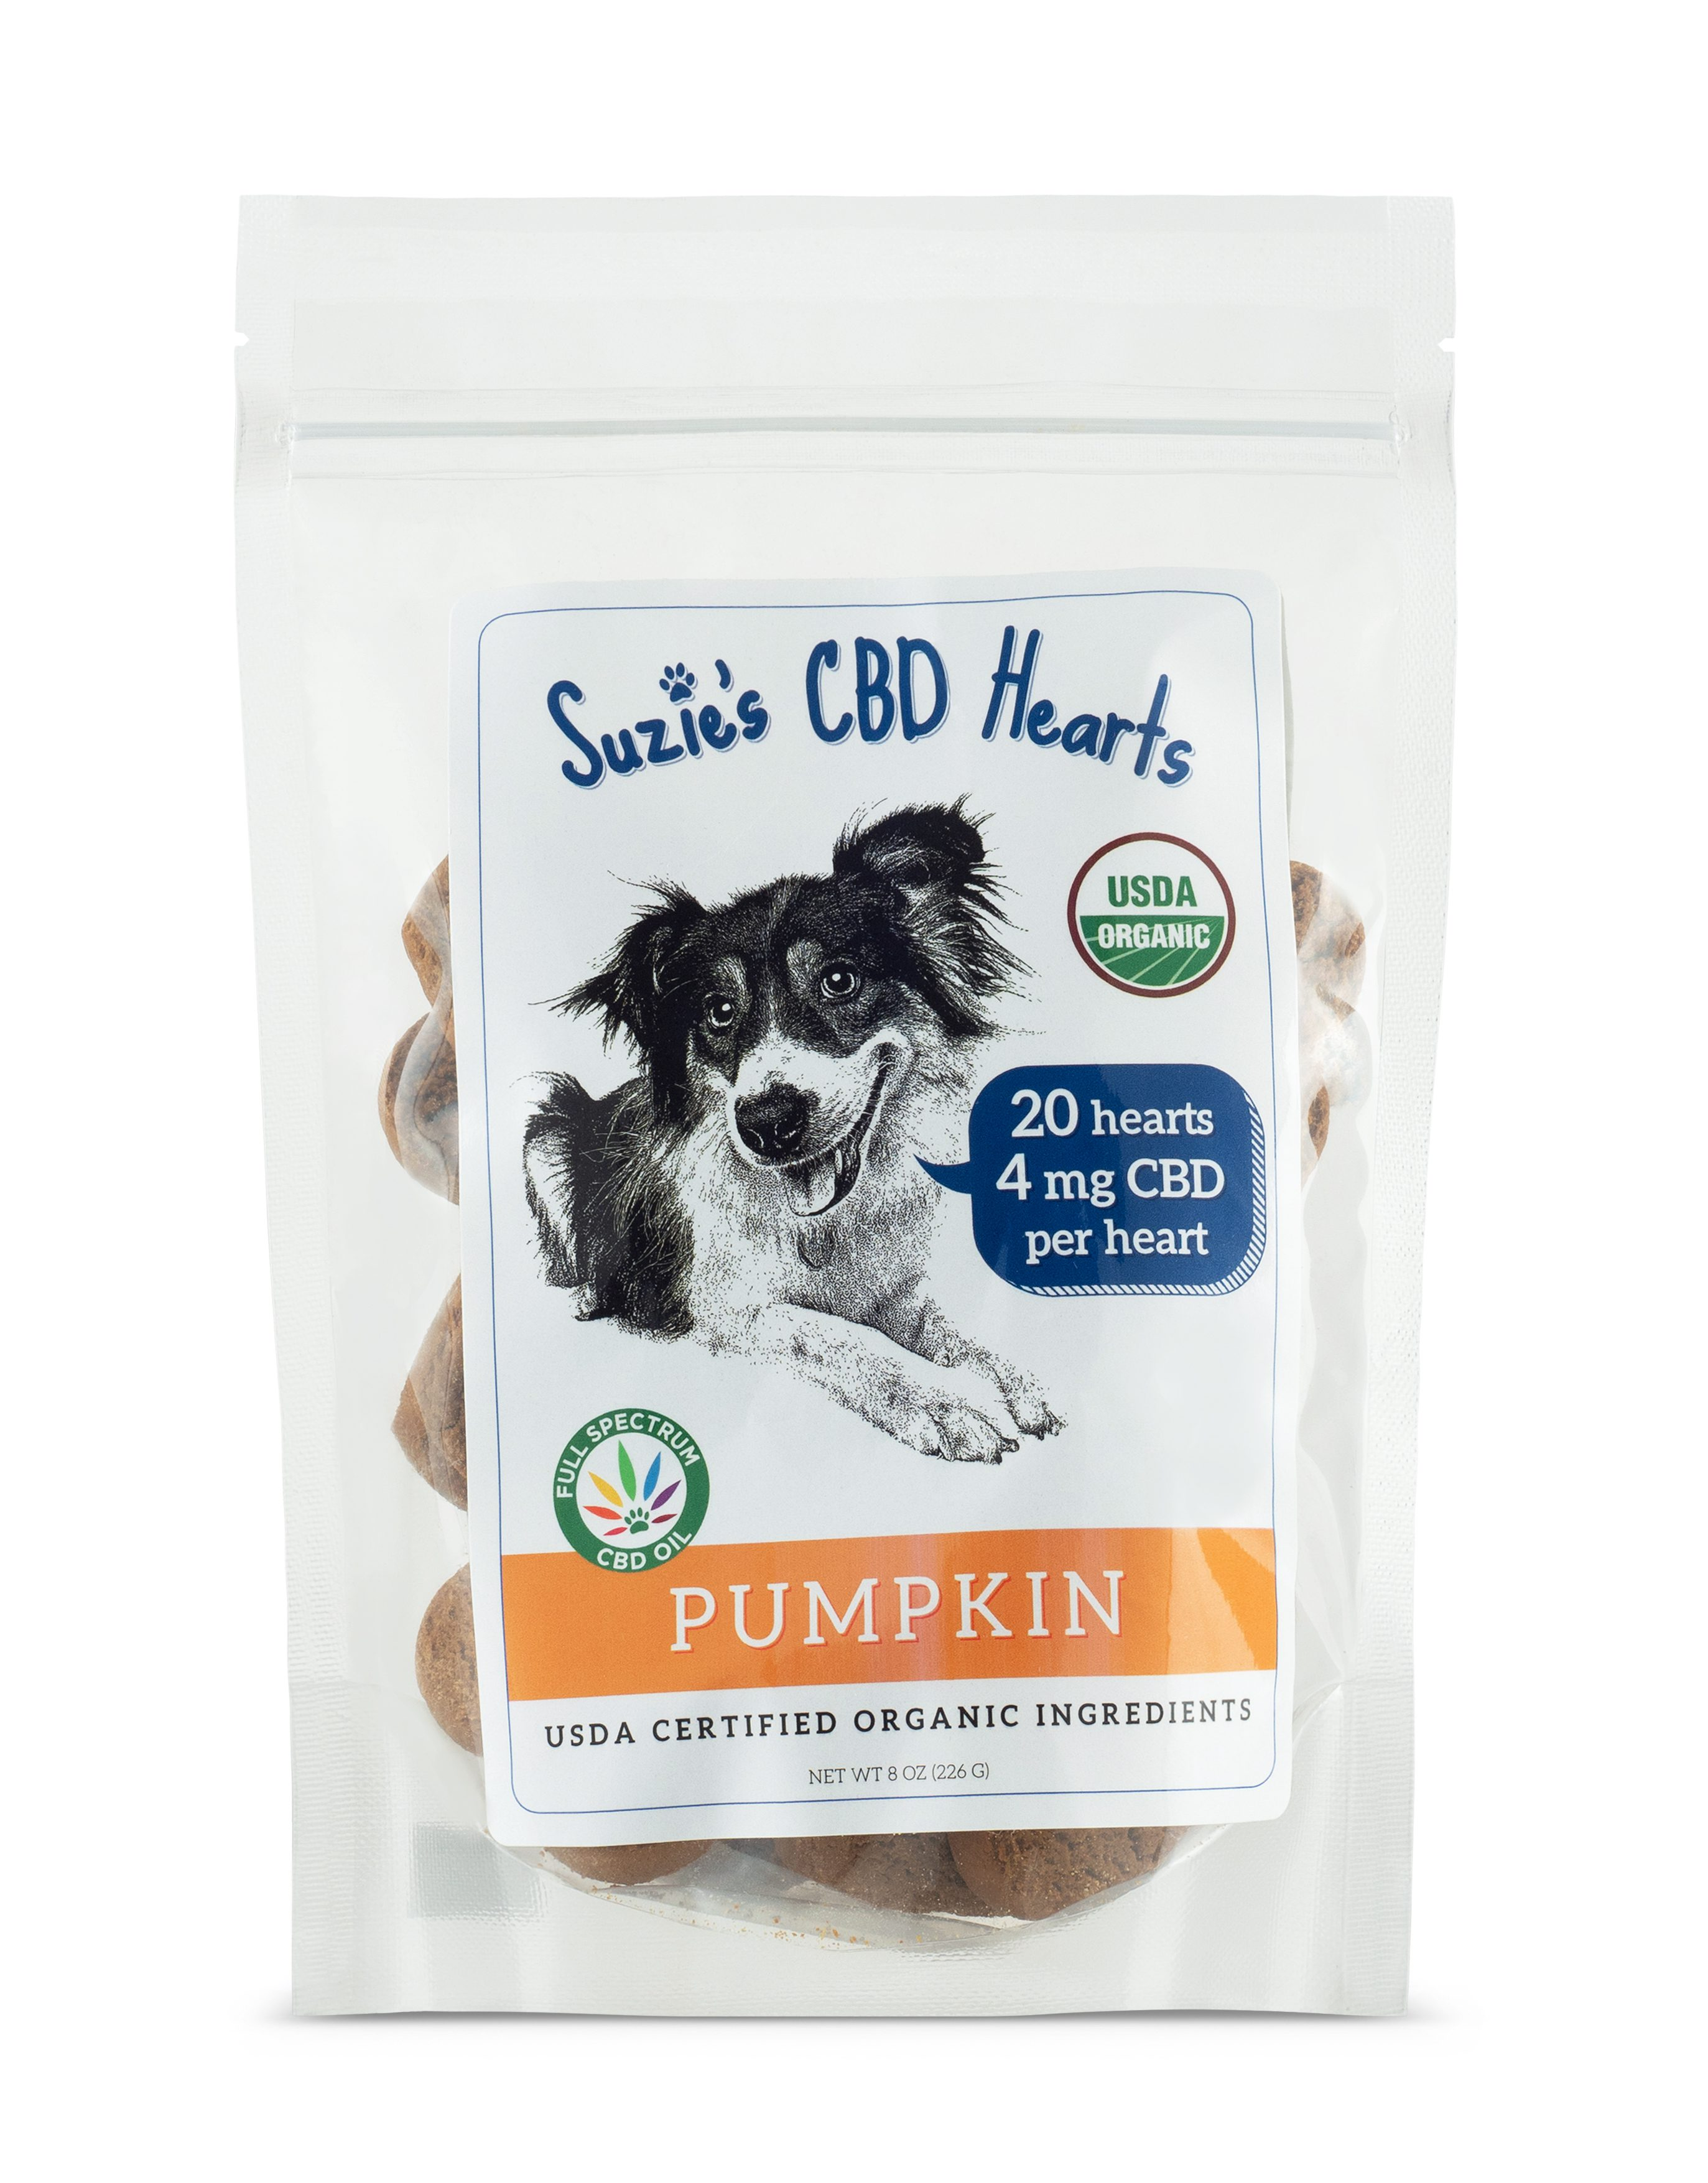 Suzie's CBD Treats 4 mg CBD Hearts Pumpkin Flavor